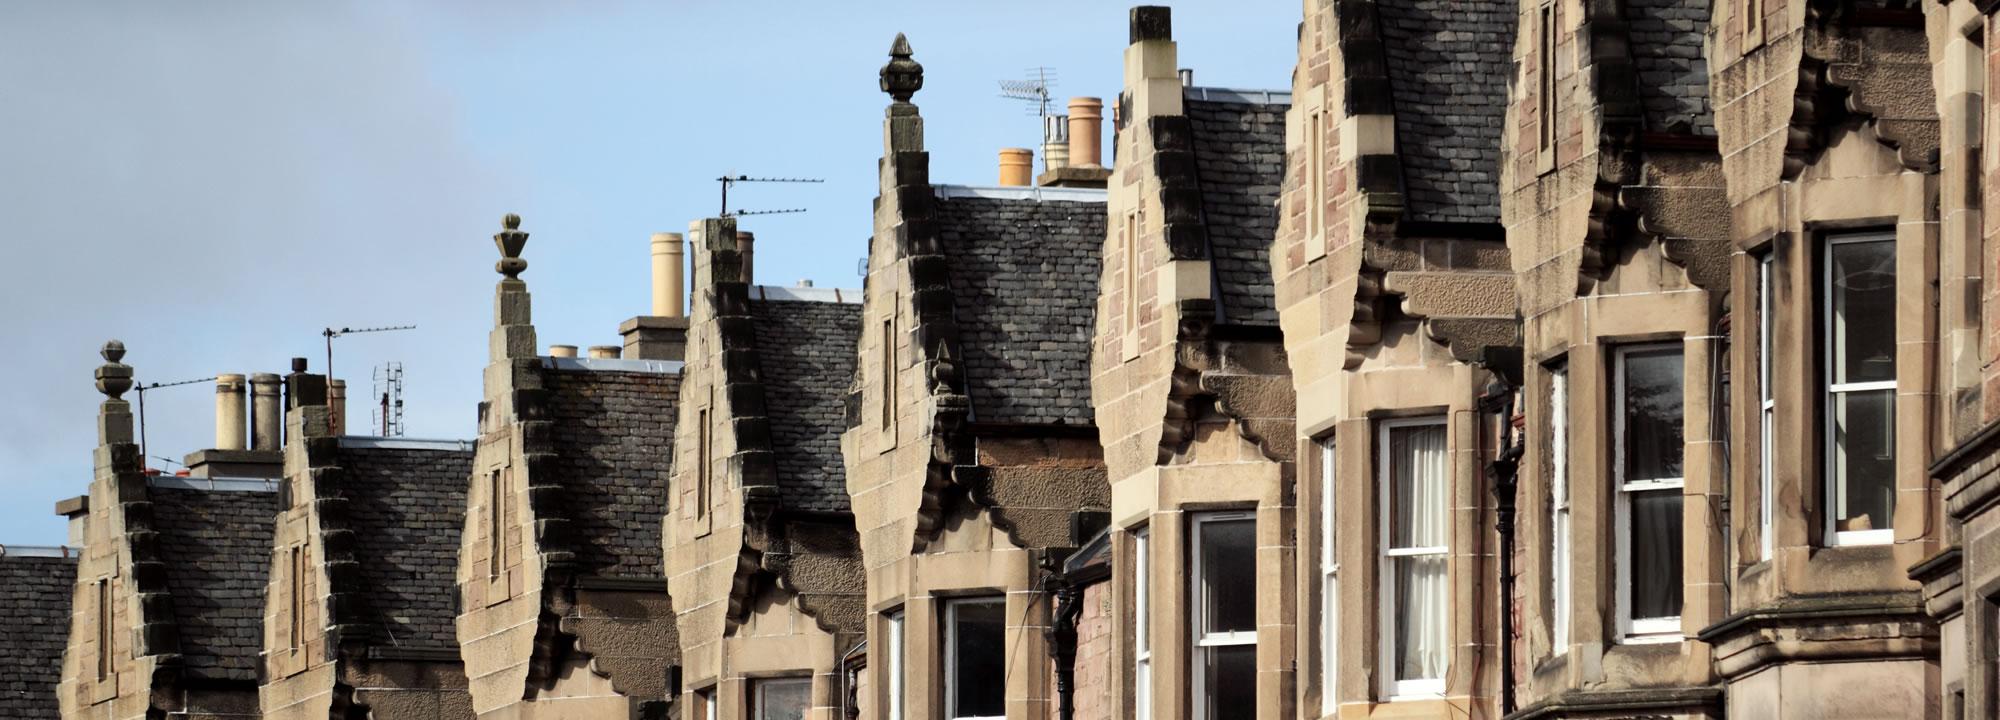 HMO property management edinburgh